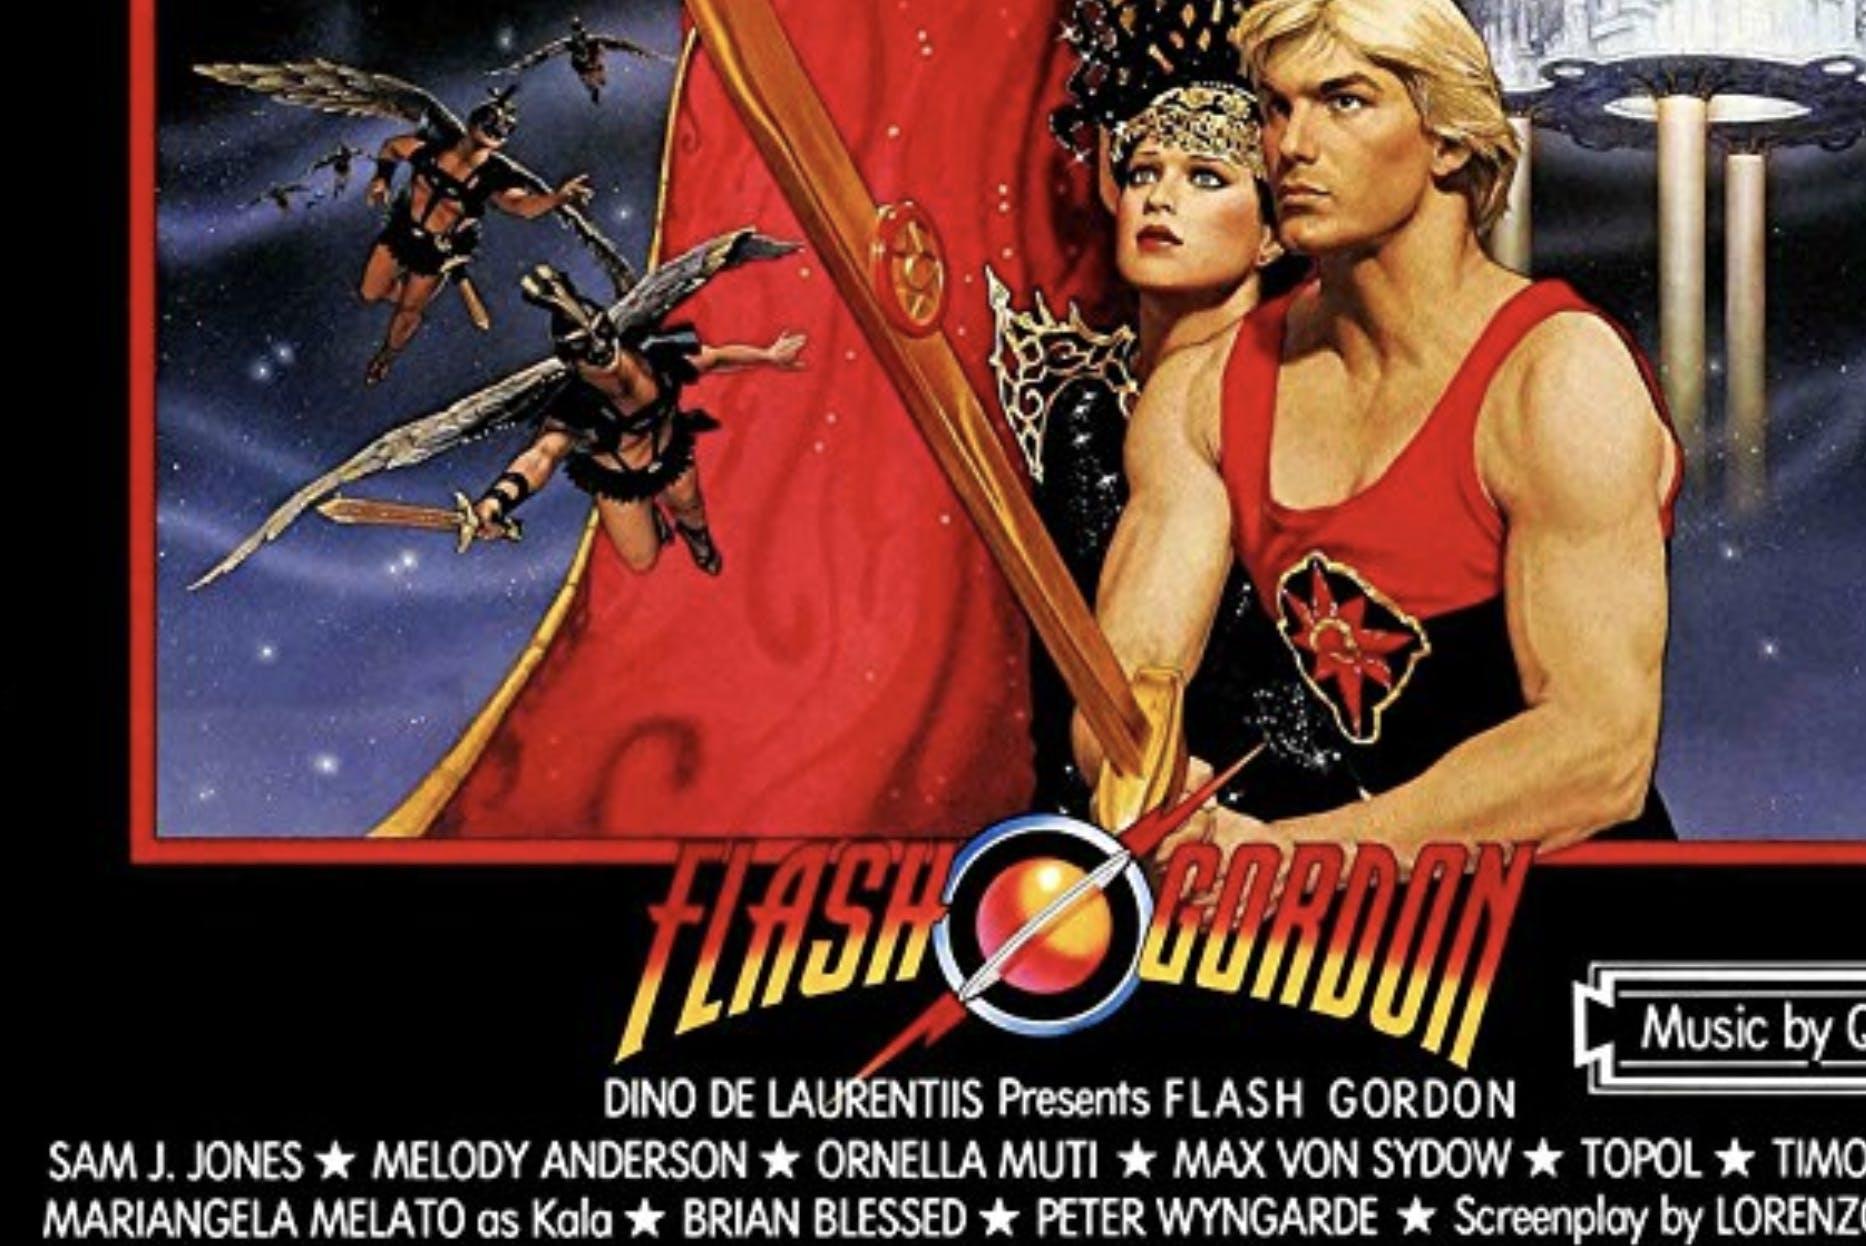 cowboy bebop : Flash Gordon poster